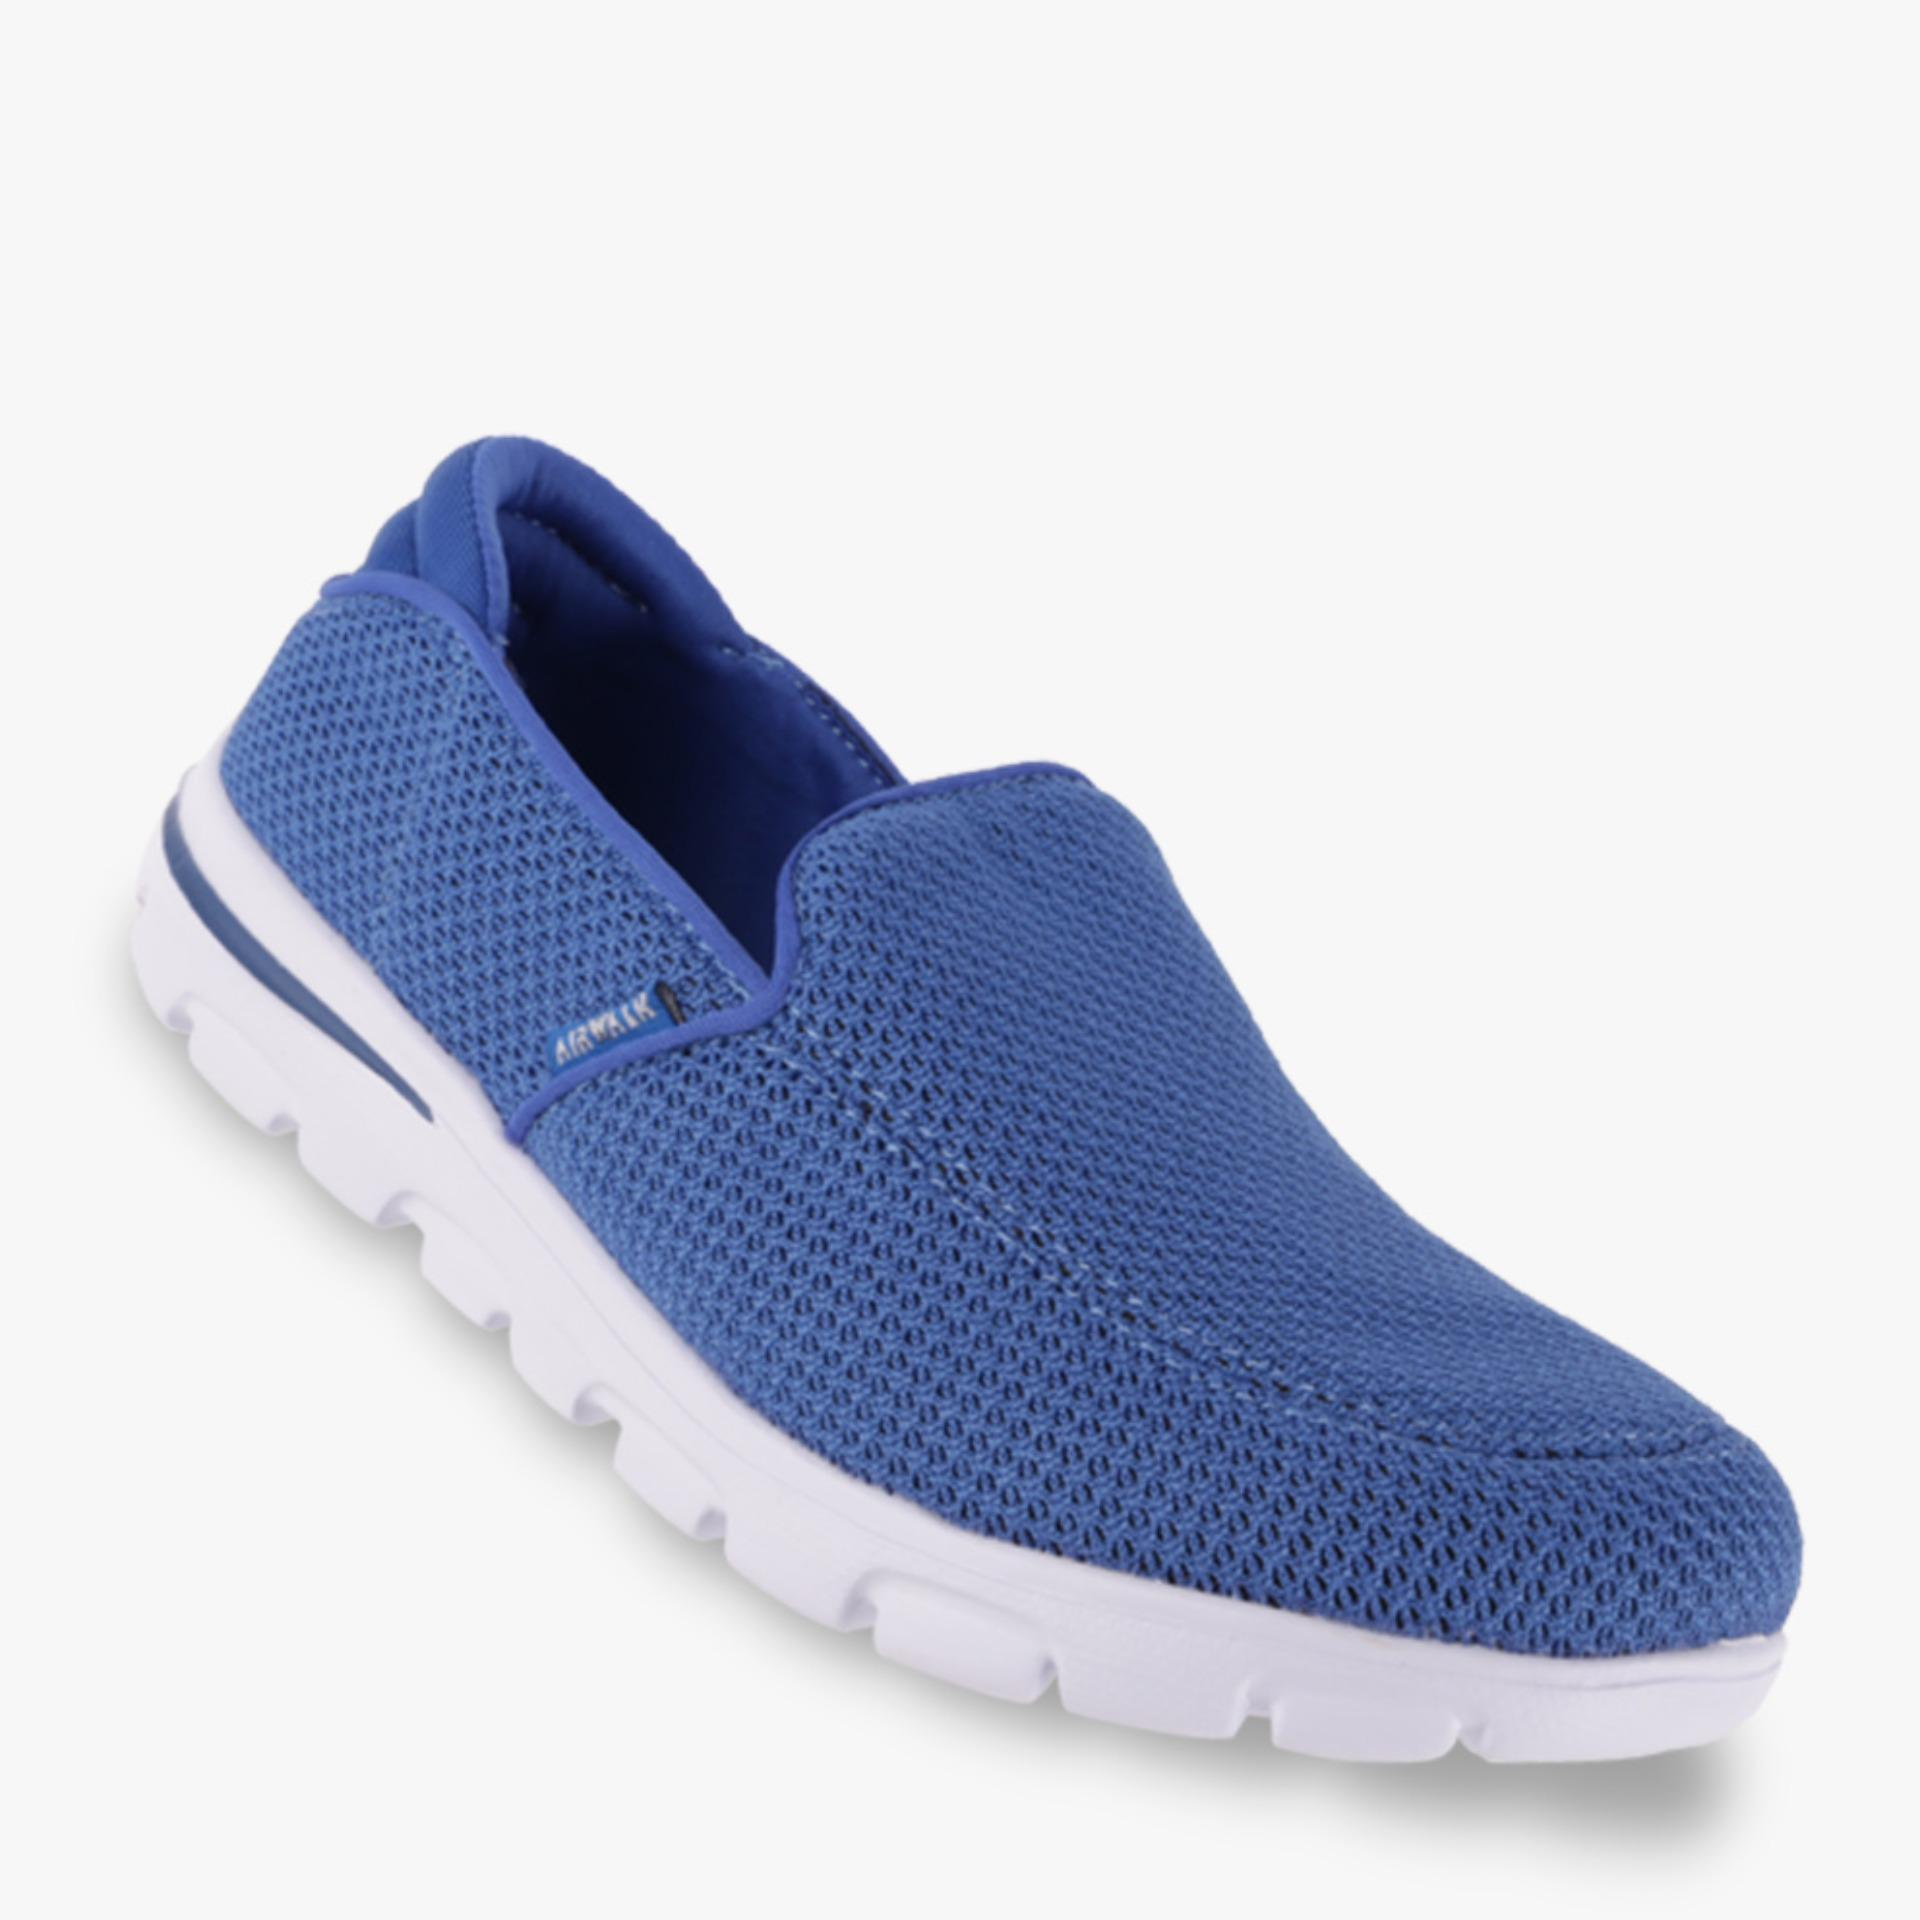 Airwalk Jalvaro Sepatu Sneakers Pria - Biru